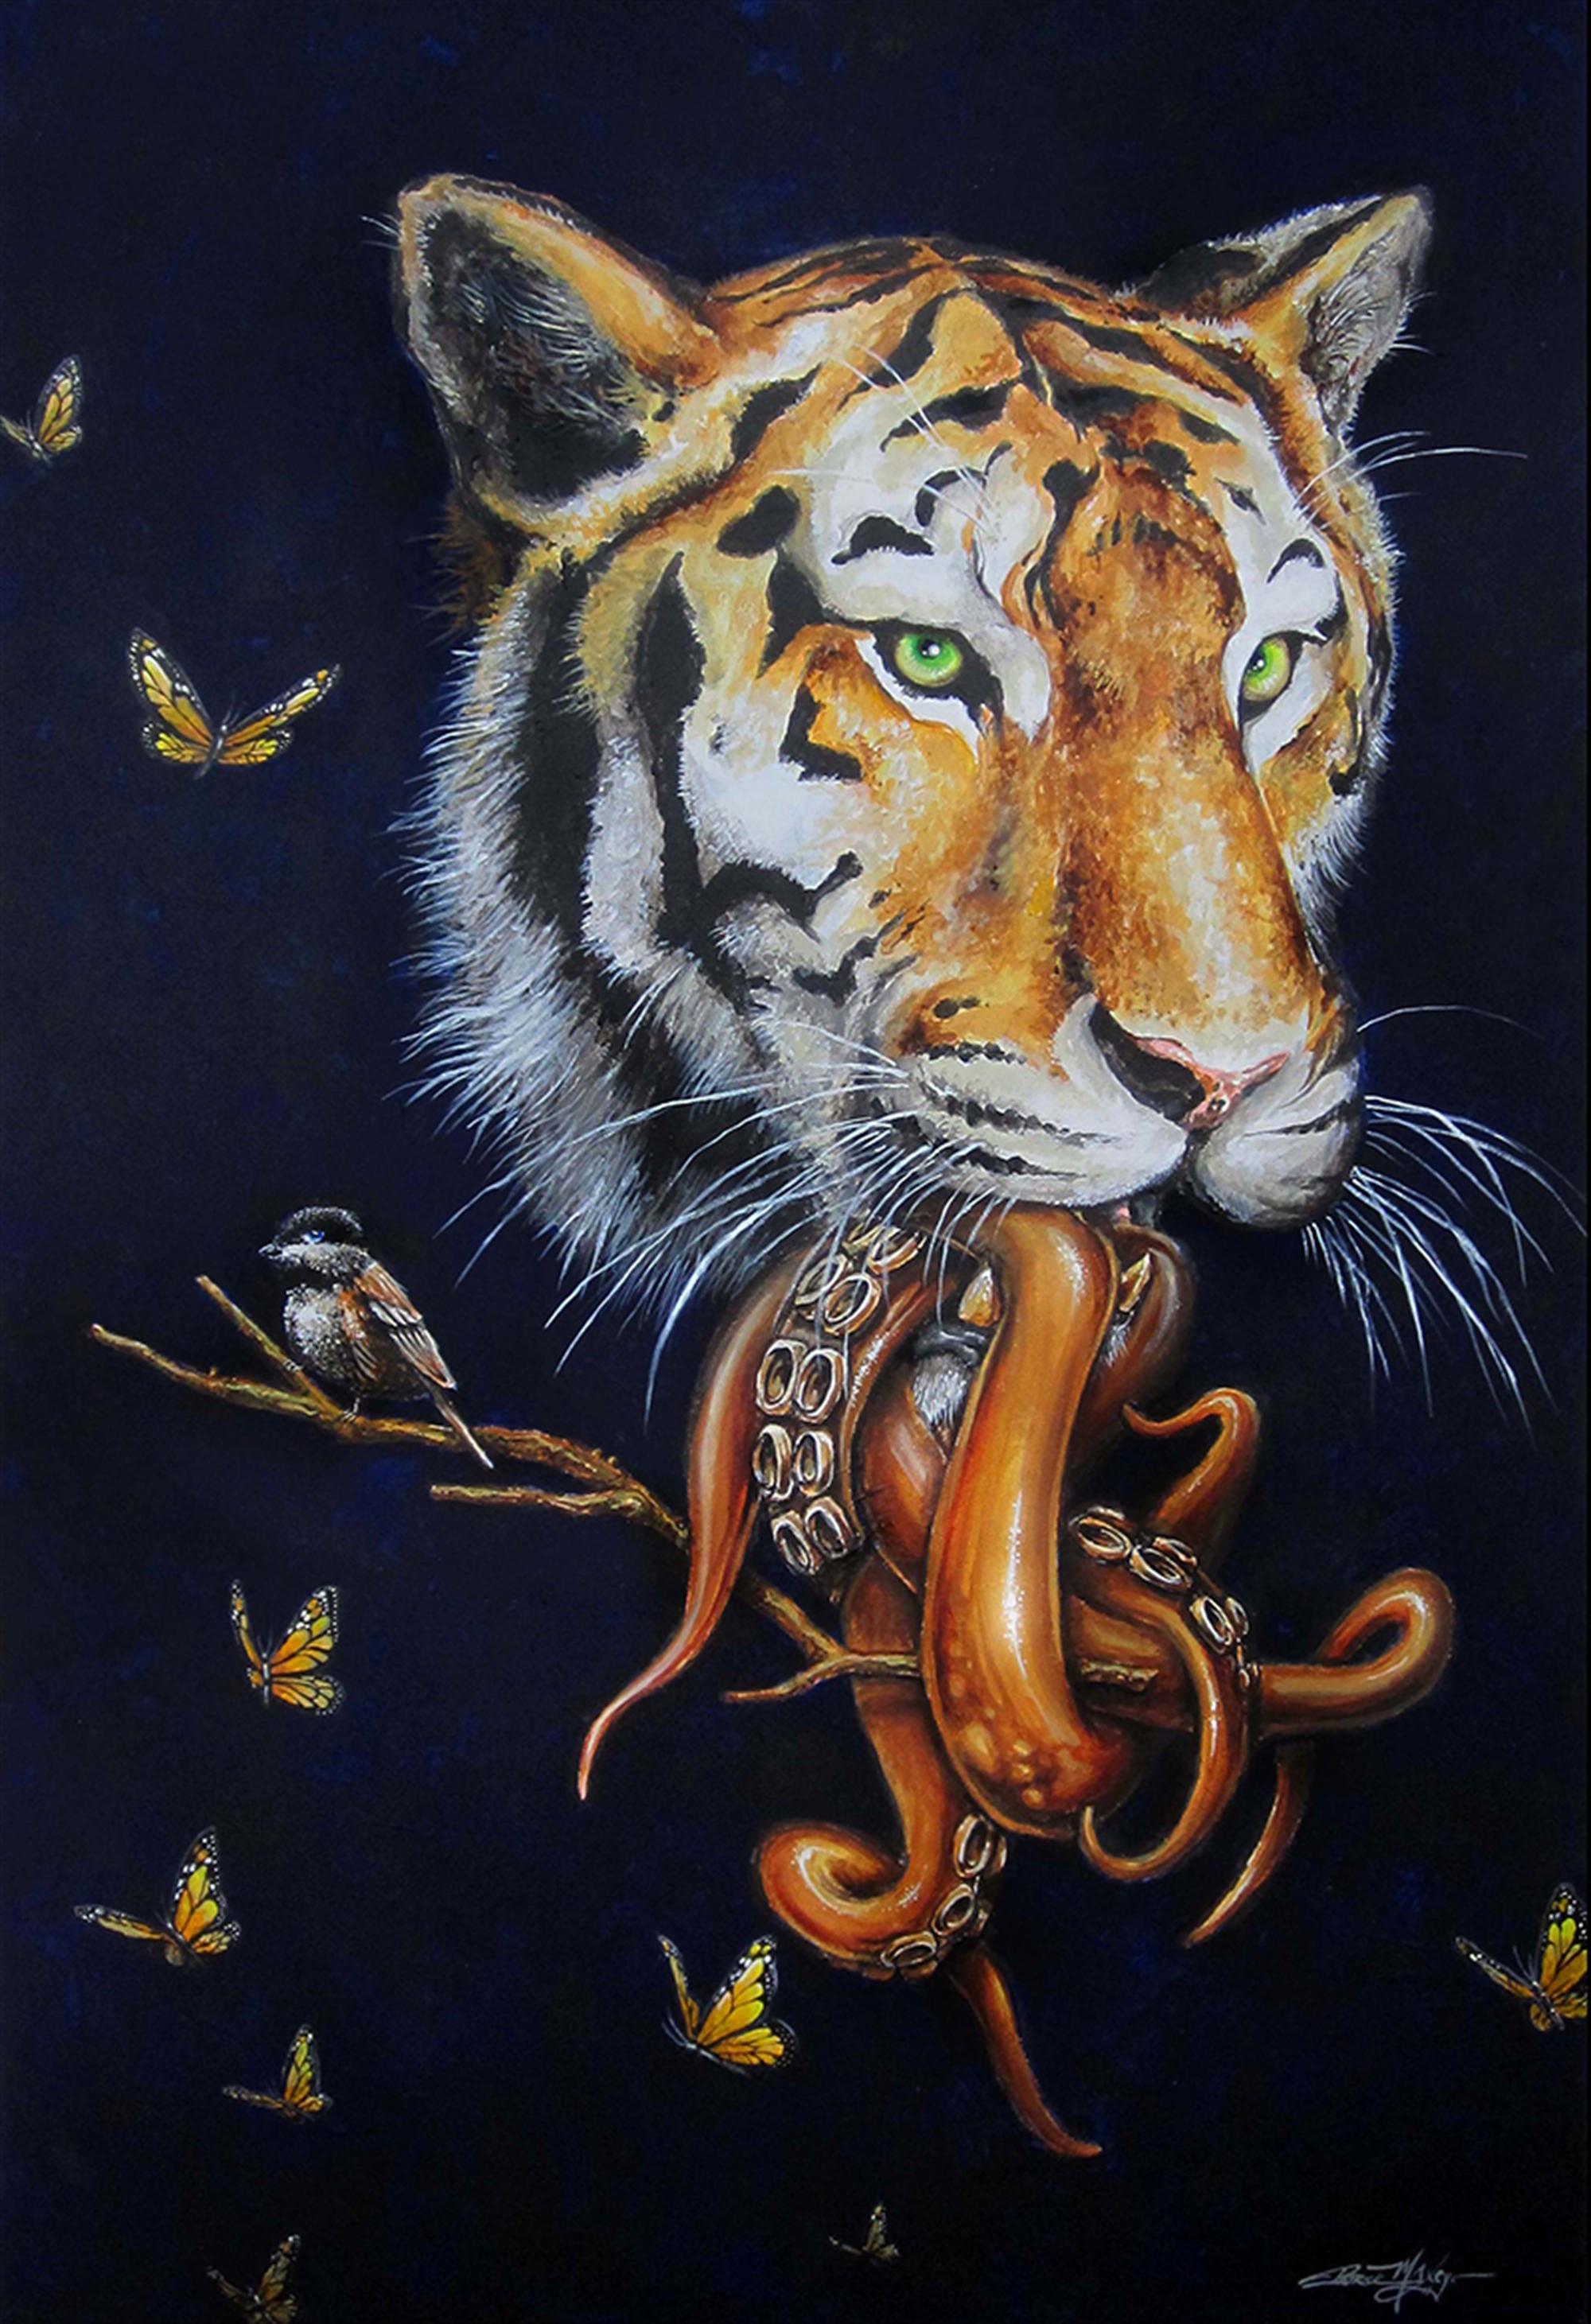 Subspecies by Patrick Maxcy